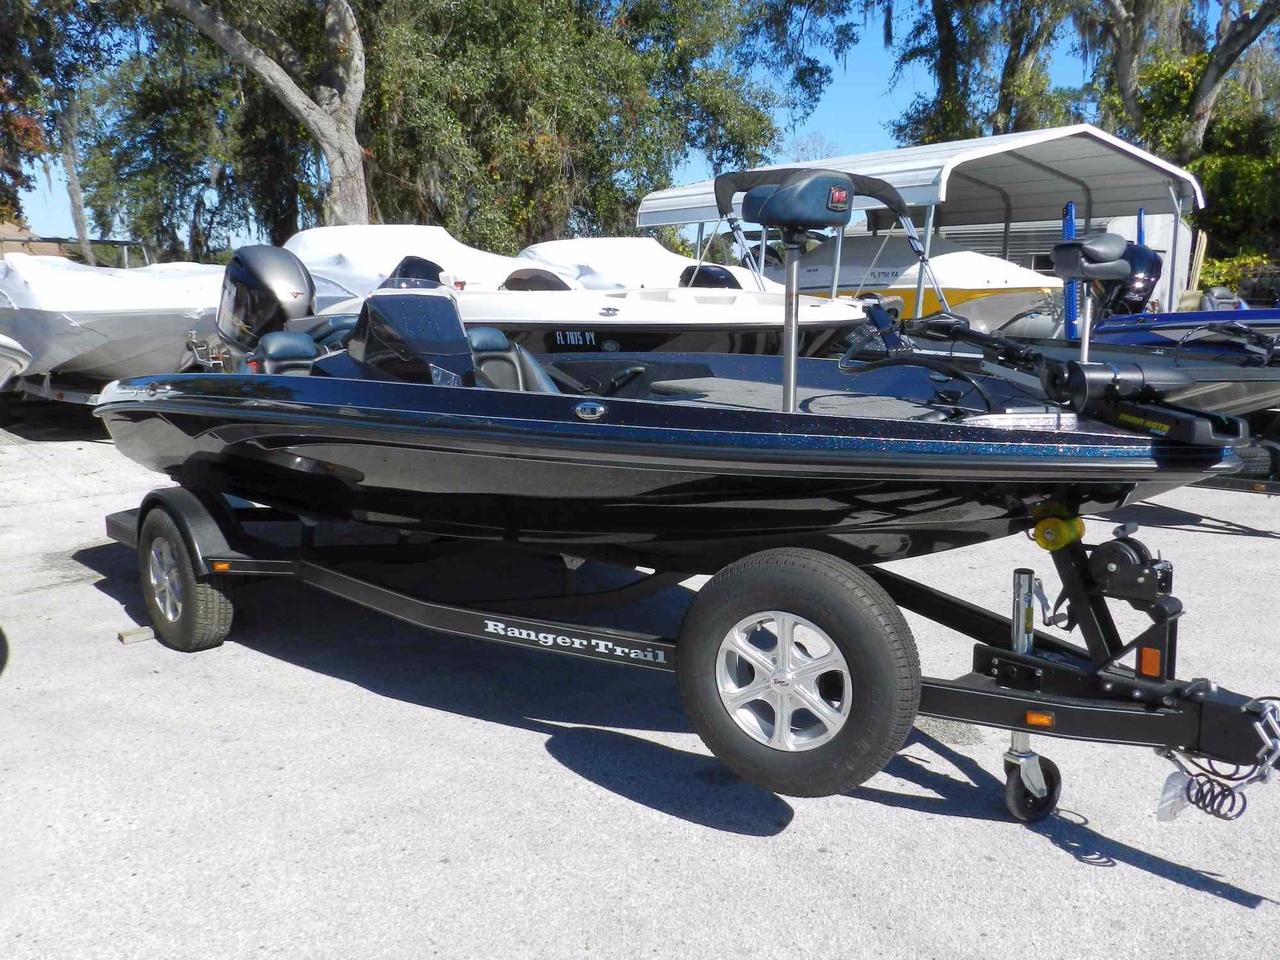 Trail Boat On Bass Tracker Wiring Diagrams Free Ranger Diagram For Sale Used Rh Bassboatforsalenkofuka Blogspot Com Pro Guide Simple